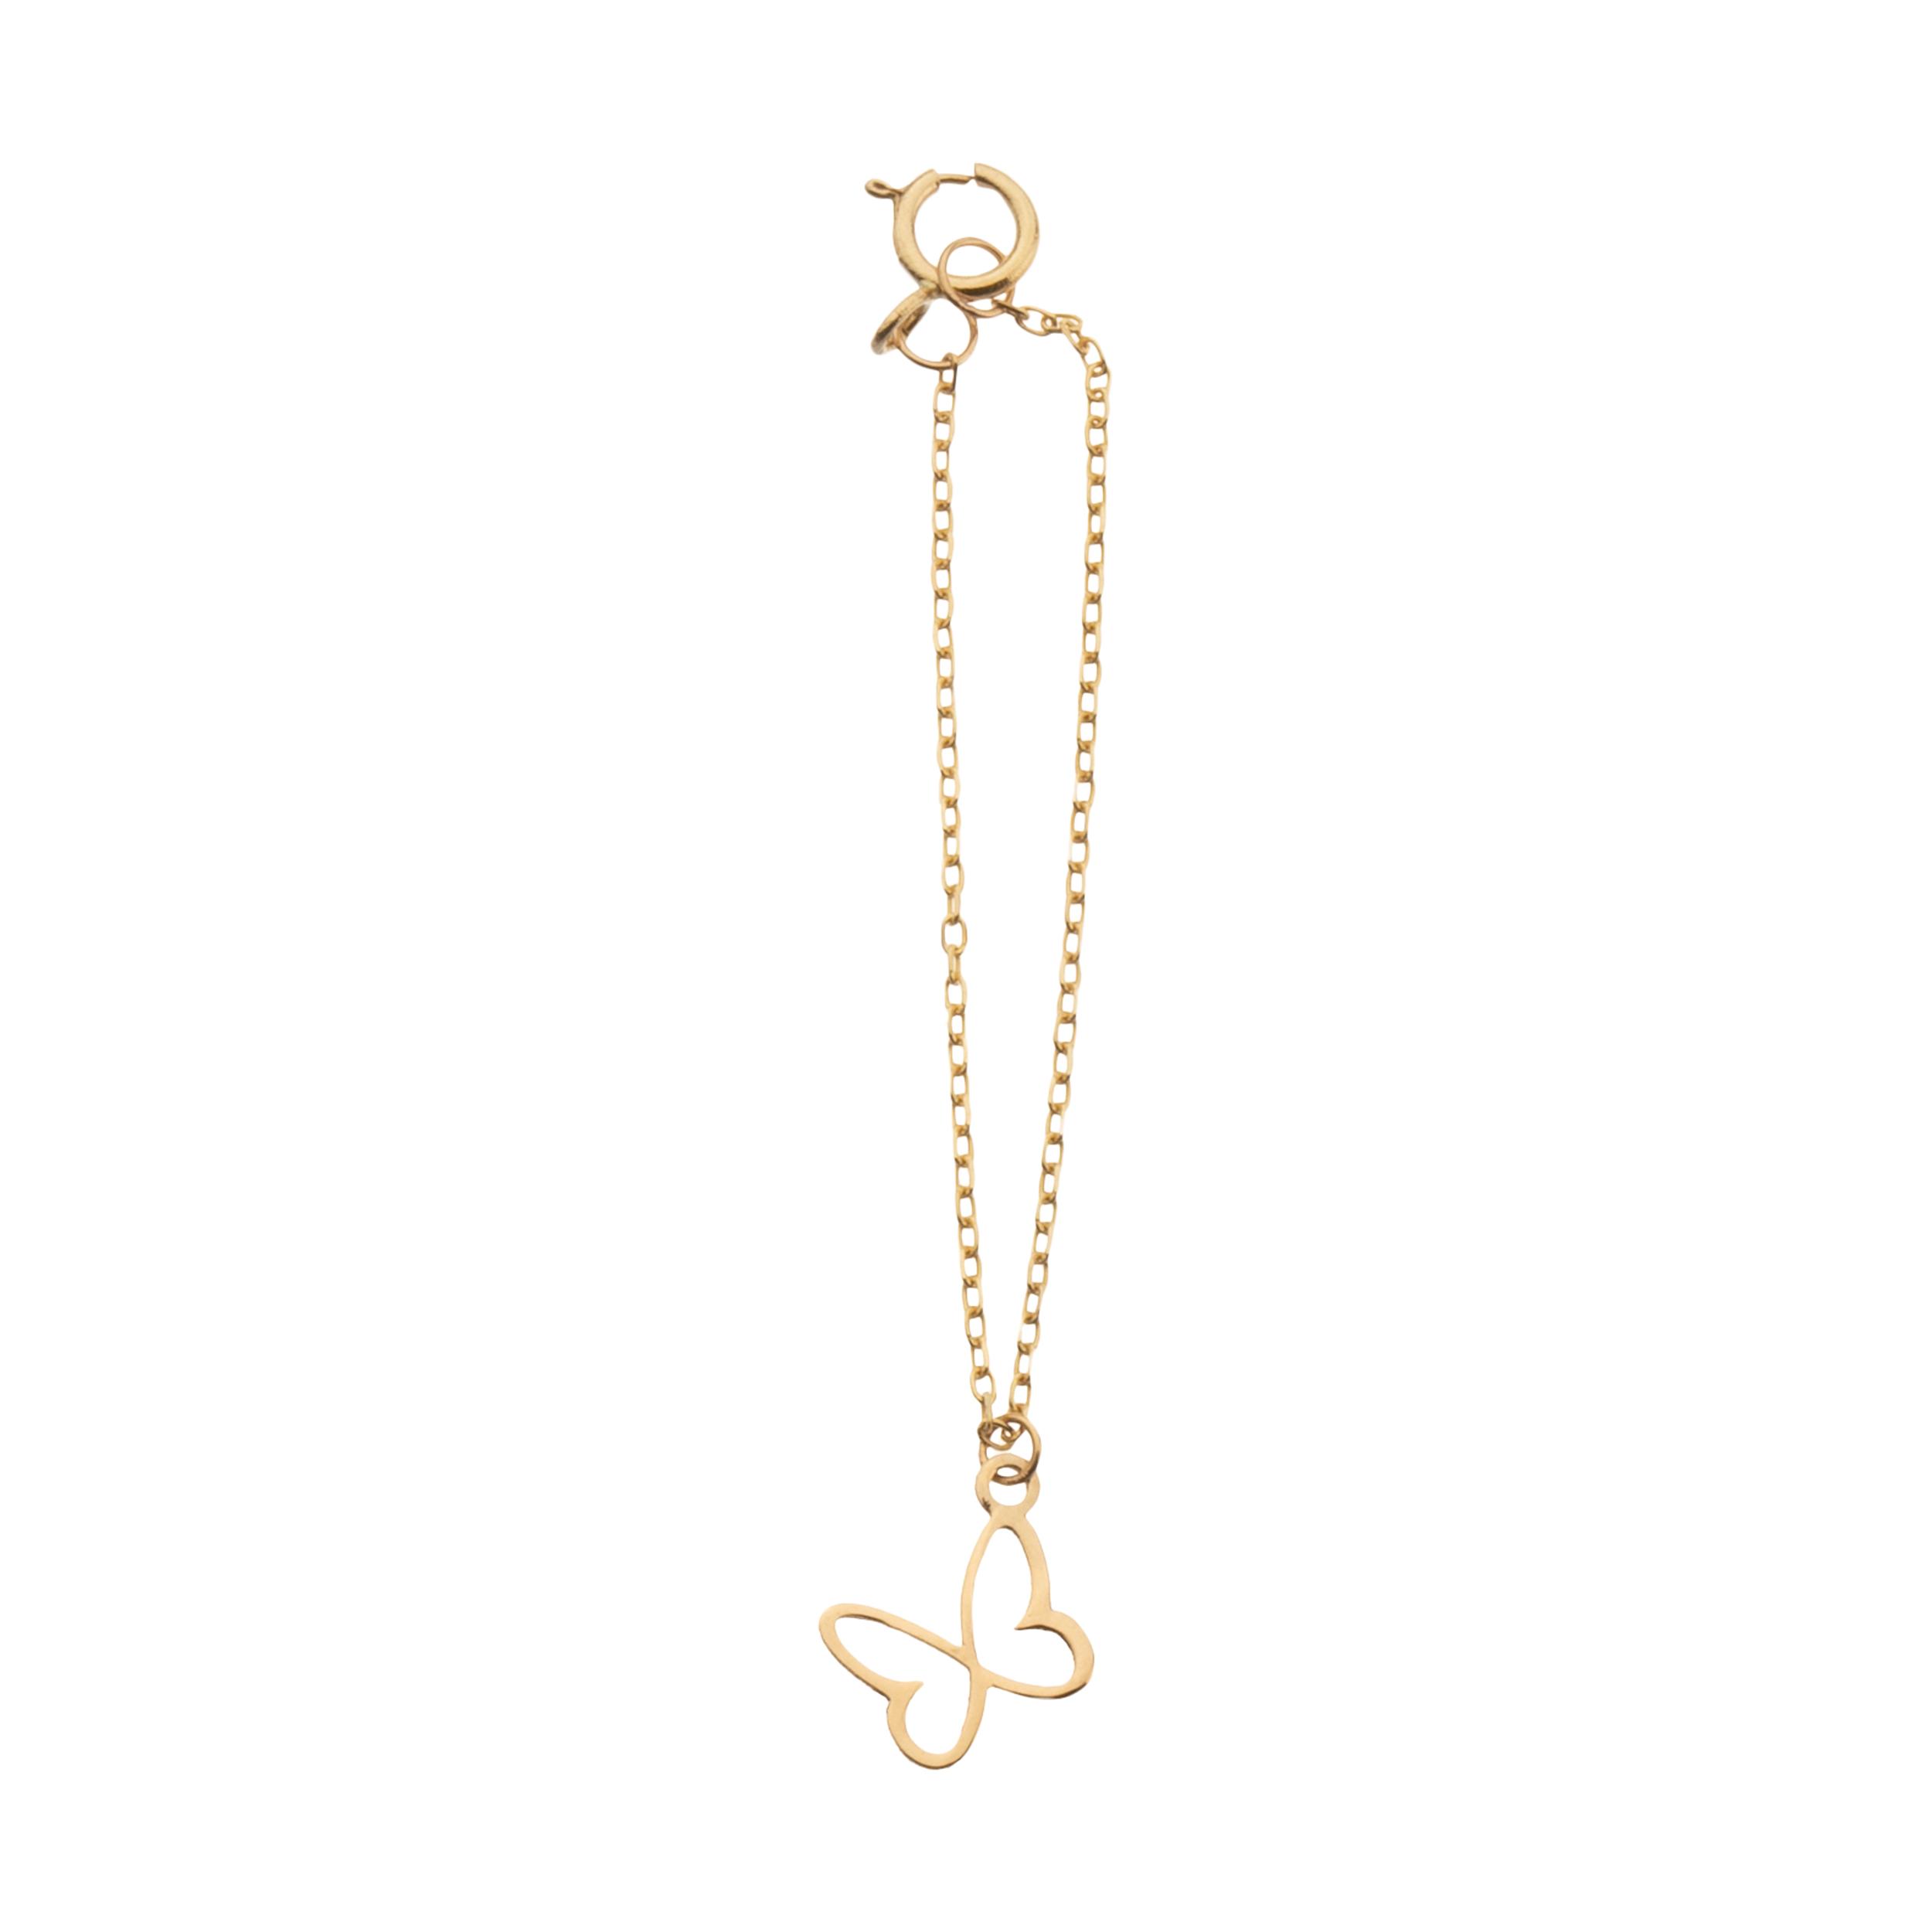 آویز ساعت طلا 18 عیار زنانه ناتروسا مدل NG205